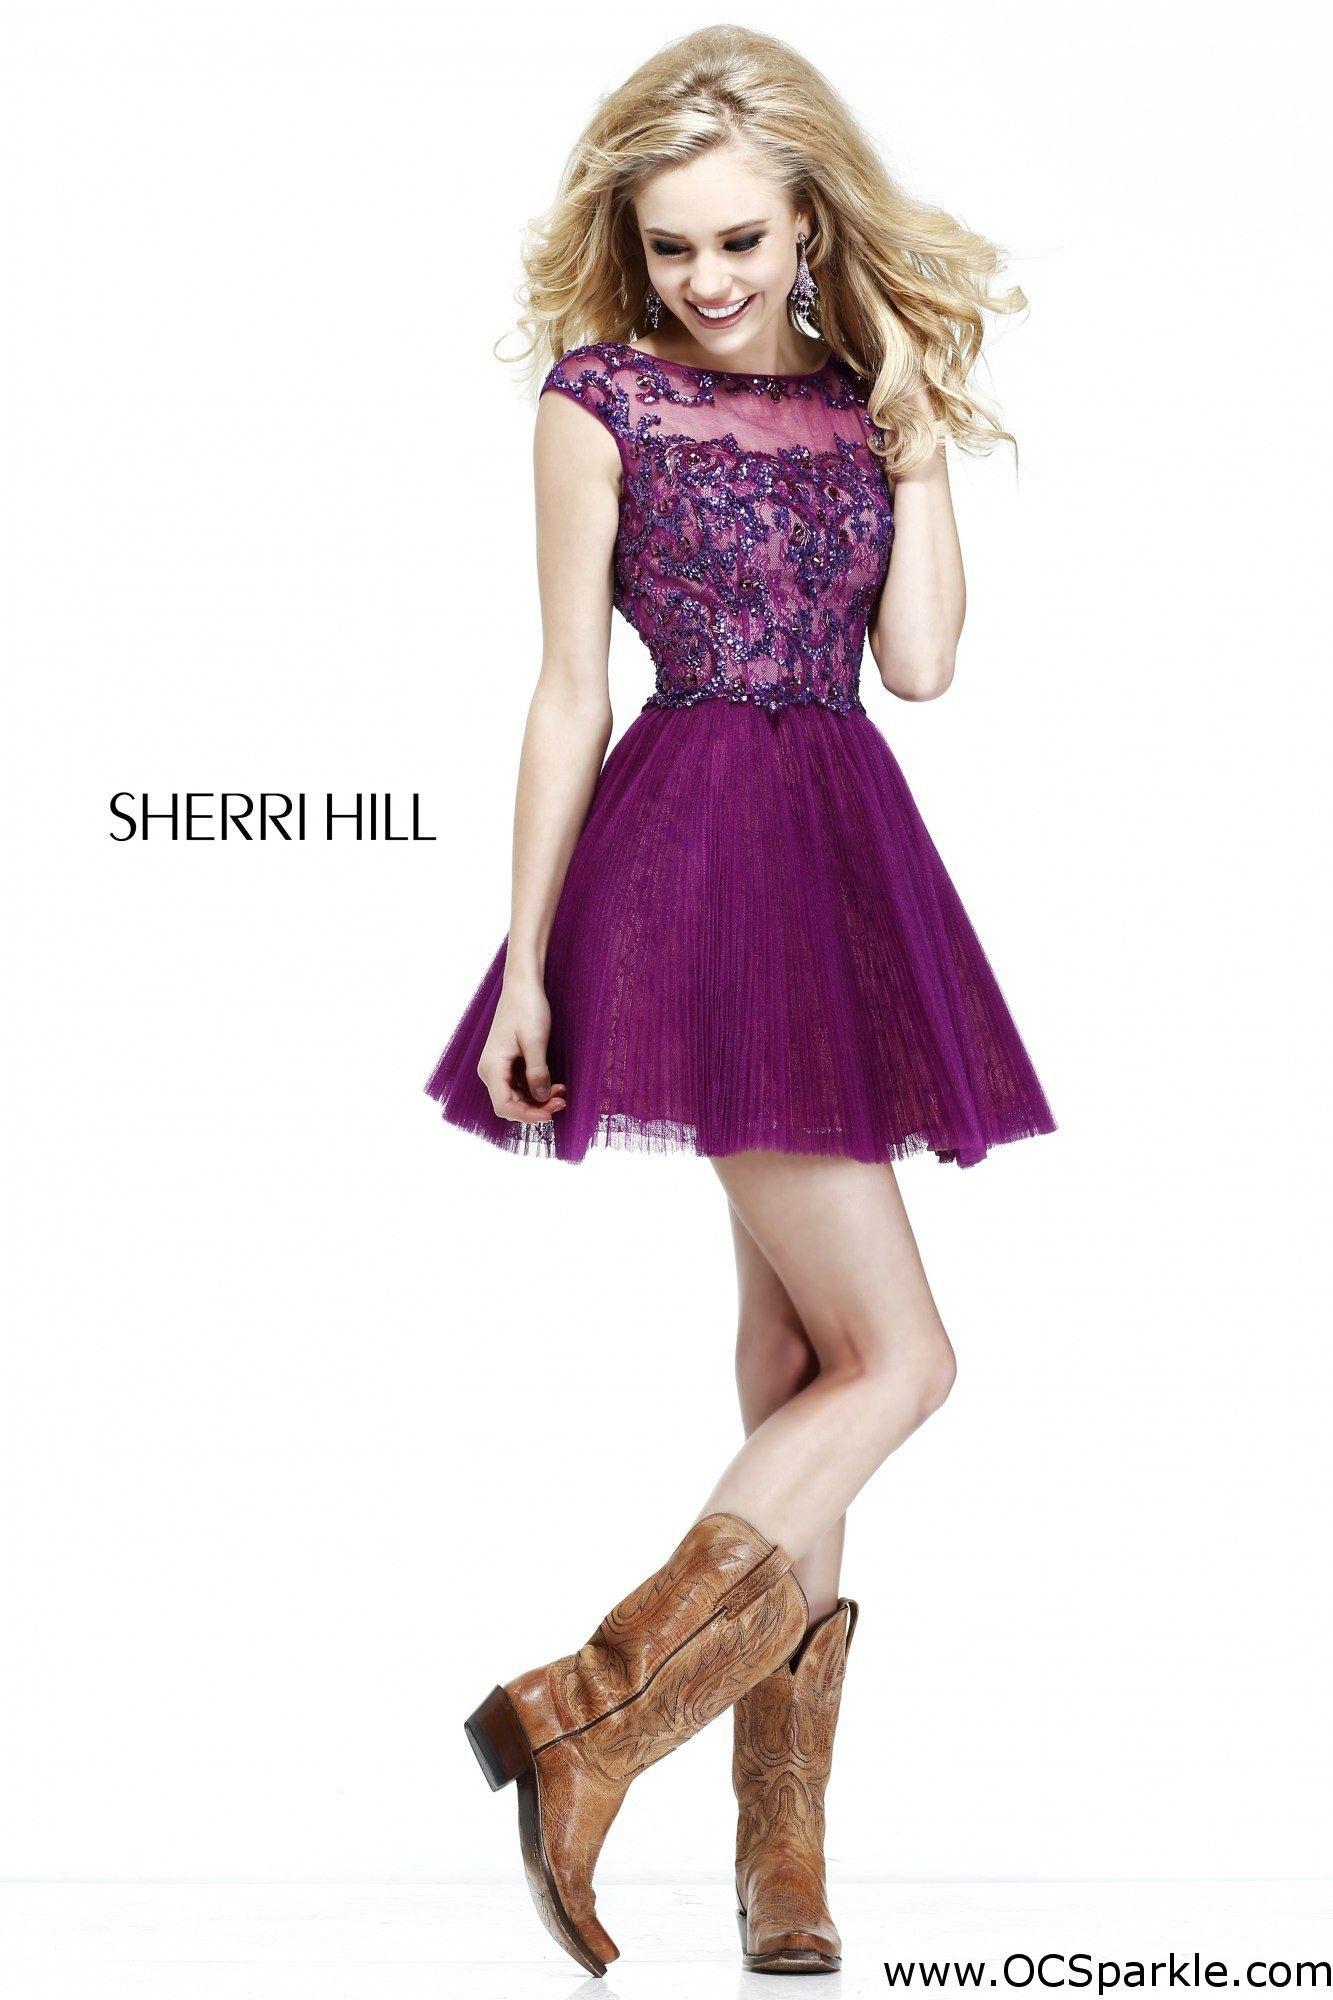 Sherri hill mode pinterest prom classy dress and formal